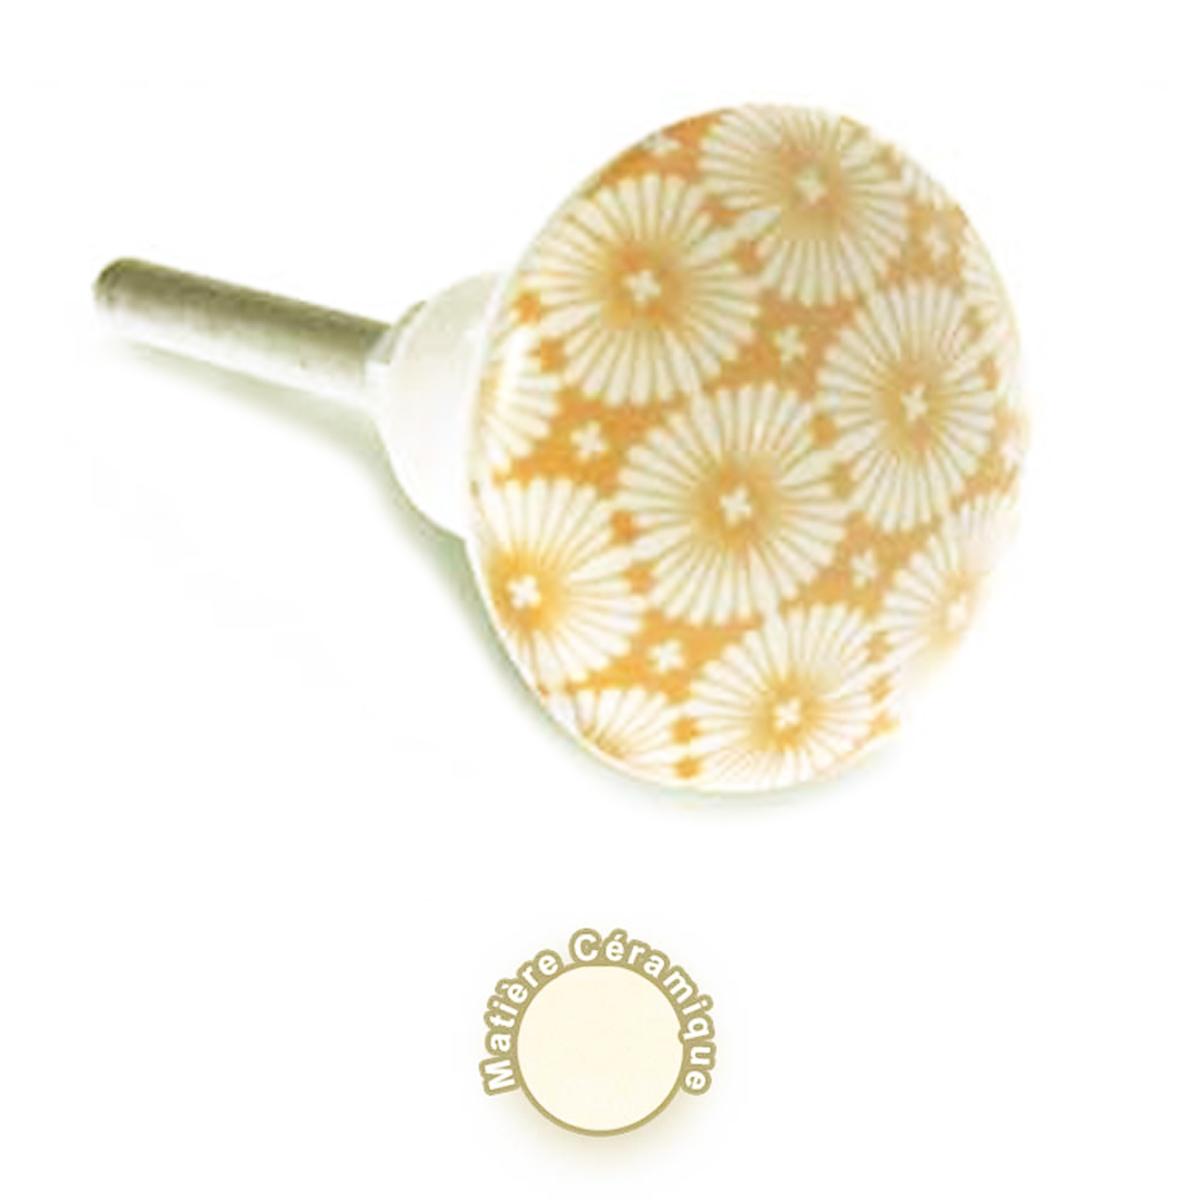 Bouton meuble céramique \'Boho\' beige blanc - 65x35 mm - [A0404]